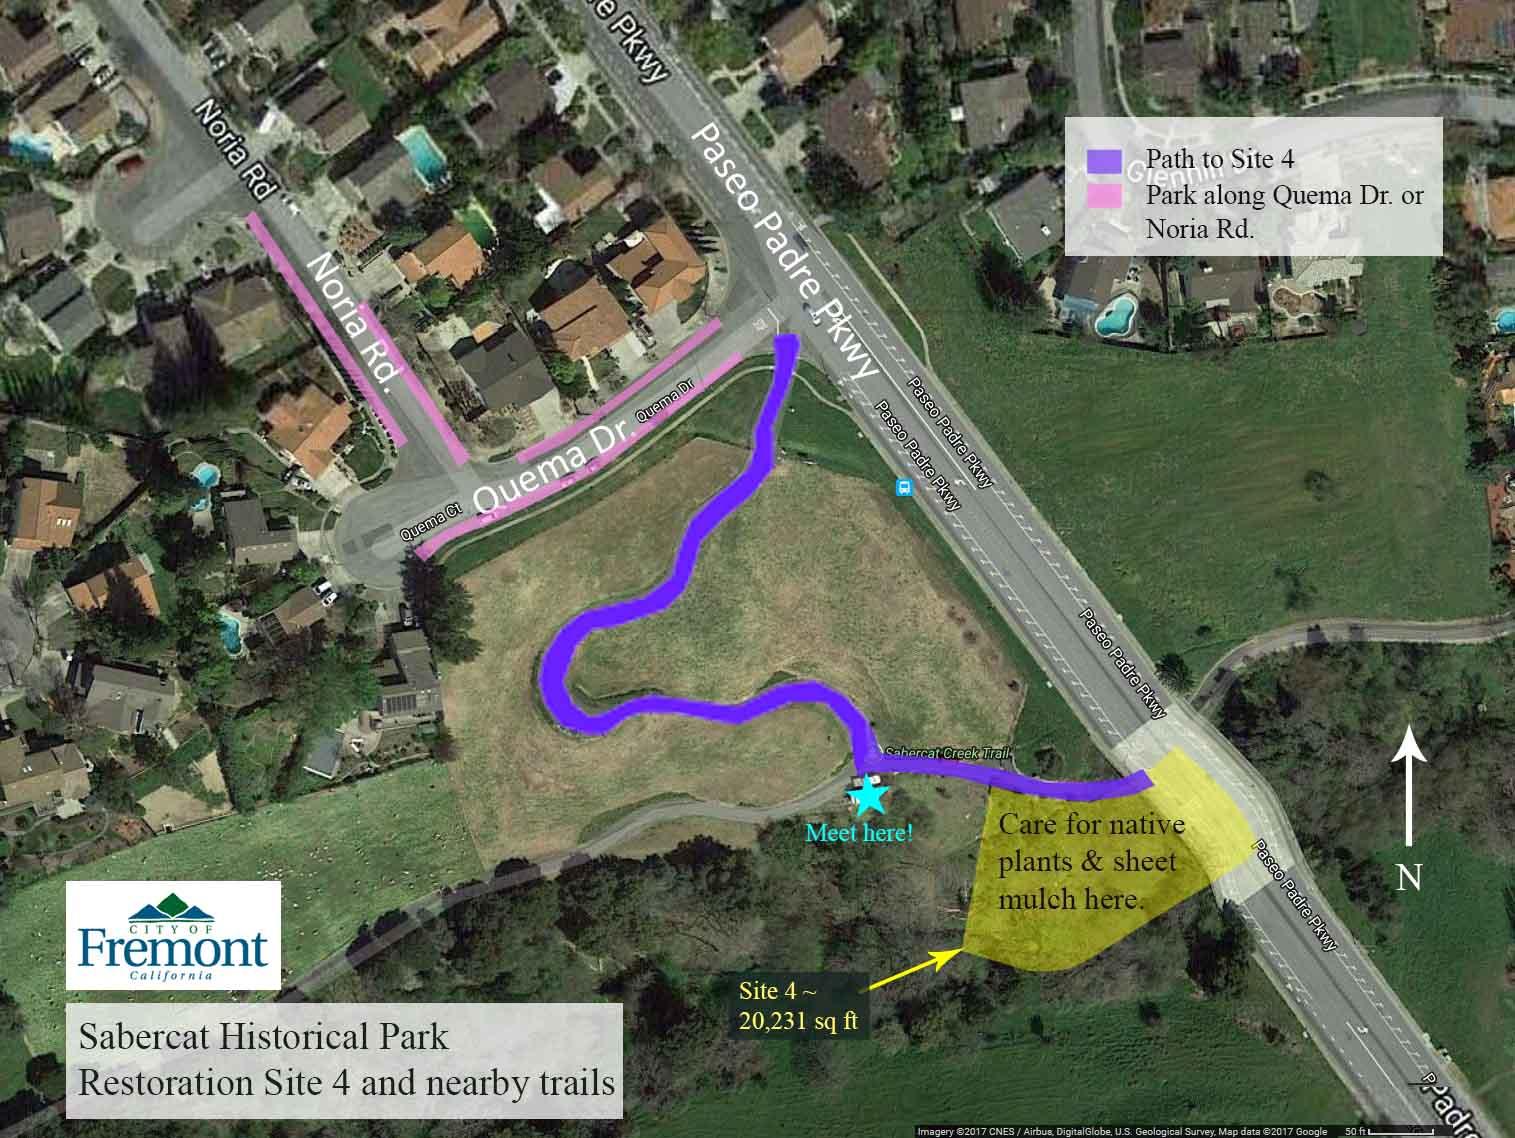 Map showing Sabercat Historical Park Restoration Site 4, surrounding trails, and parking